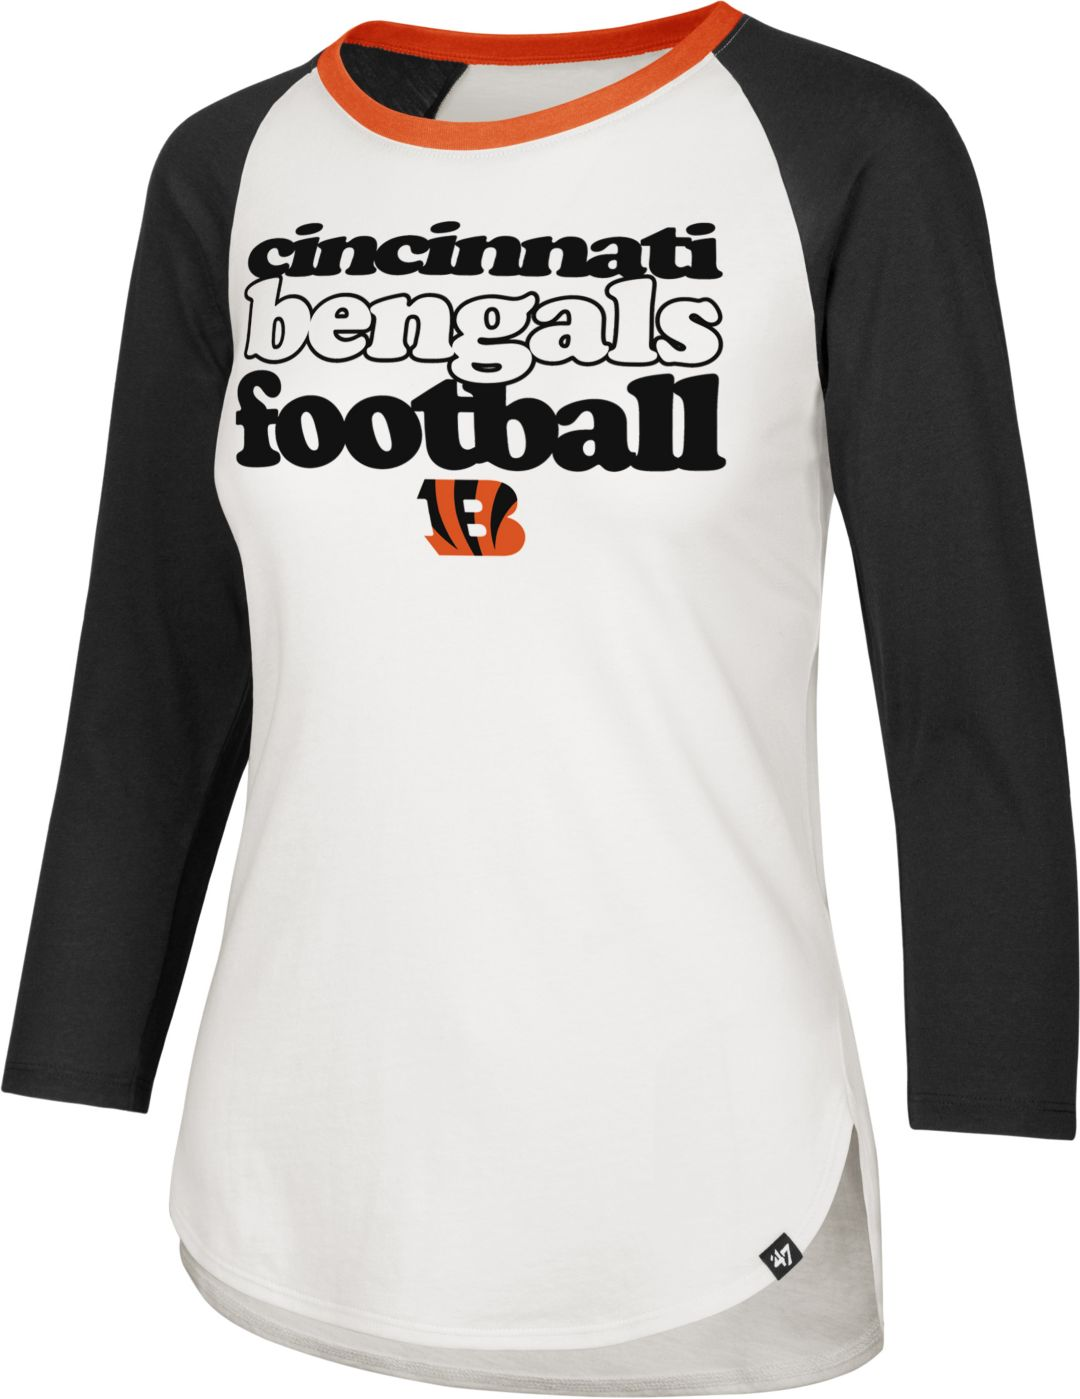 2578fb34 '47 Women's Cincinnati Bengals Retro Stock Throwback Raglan Shirt